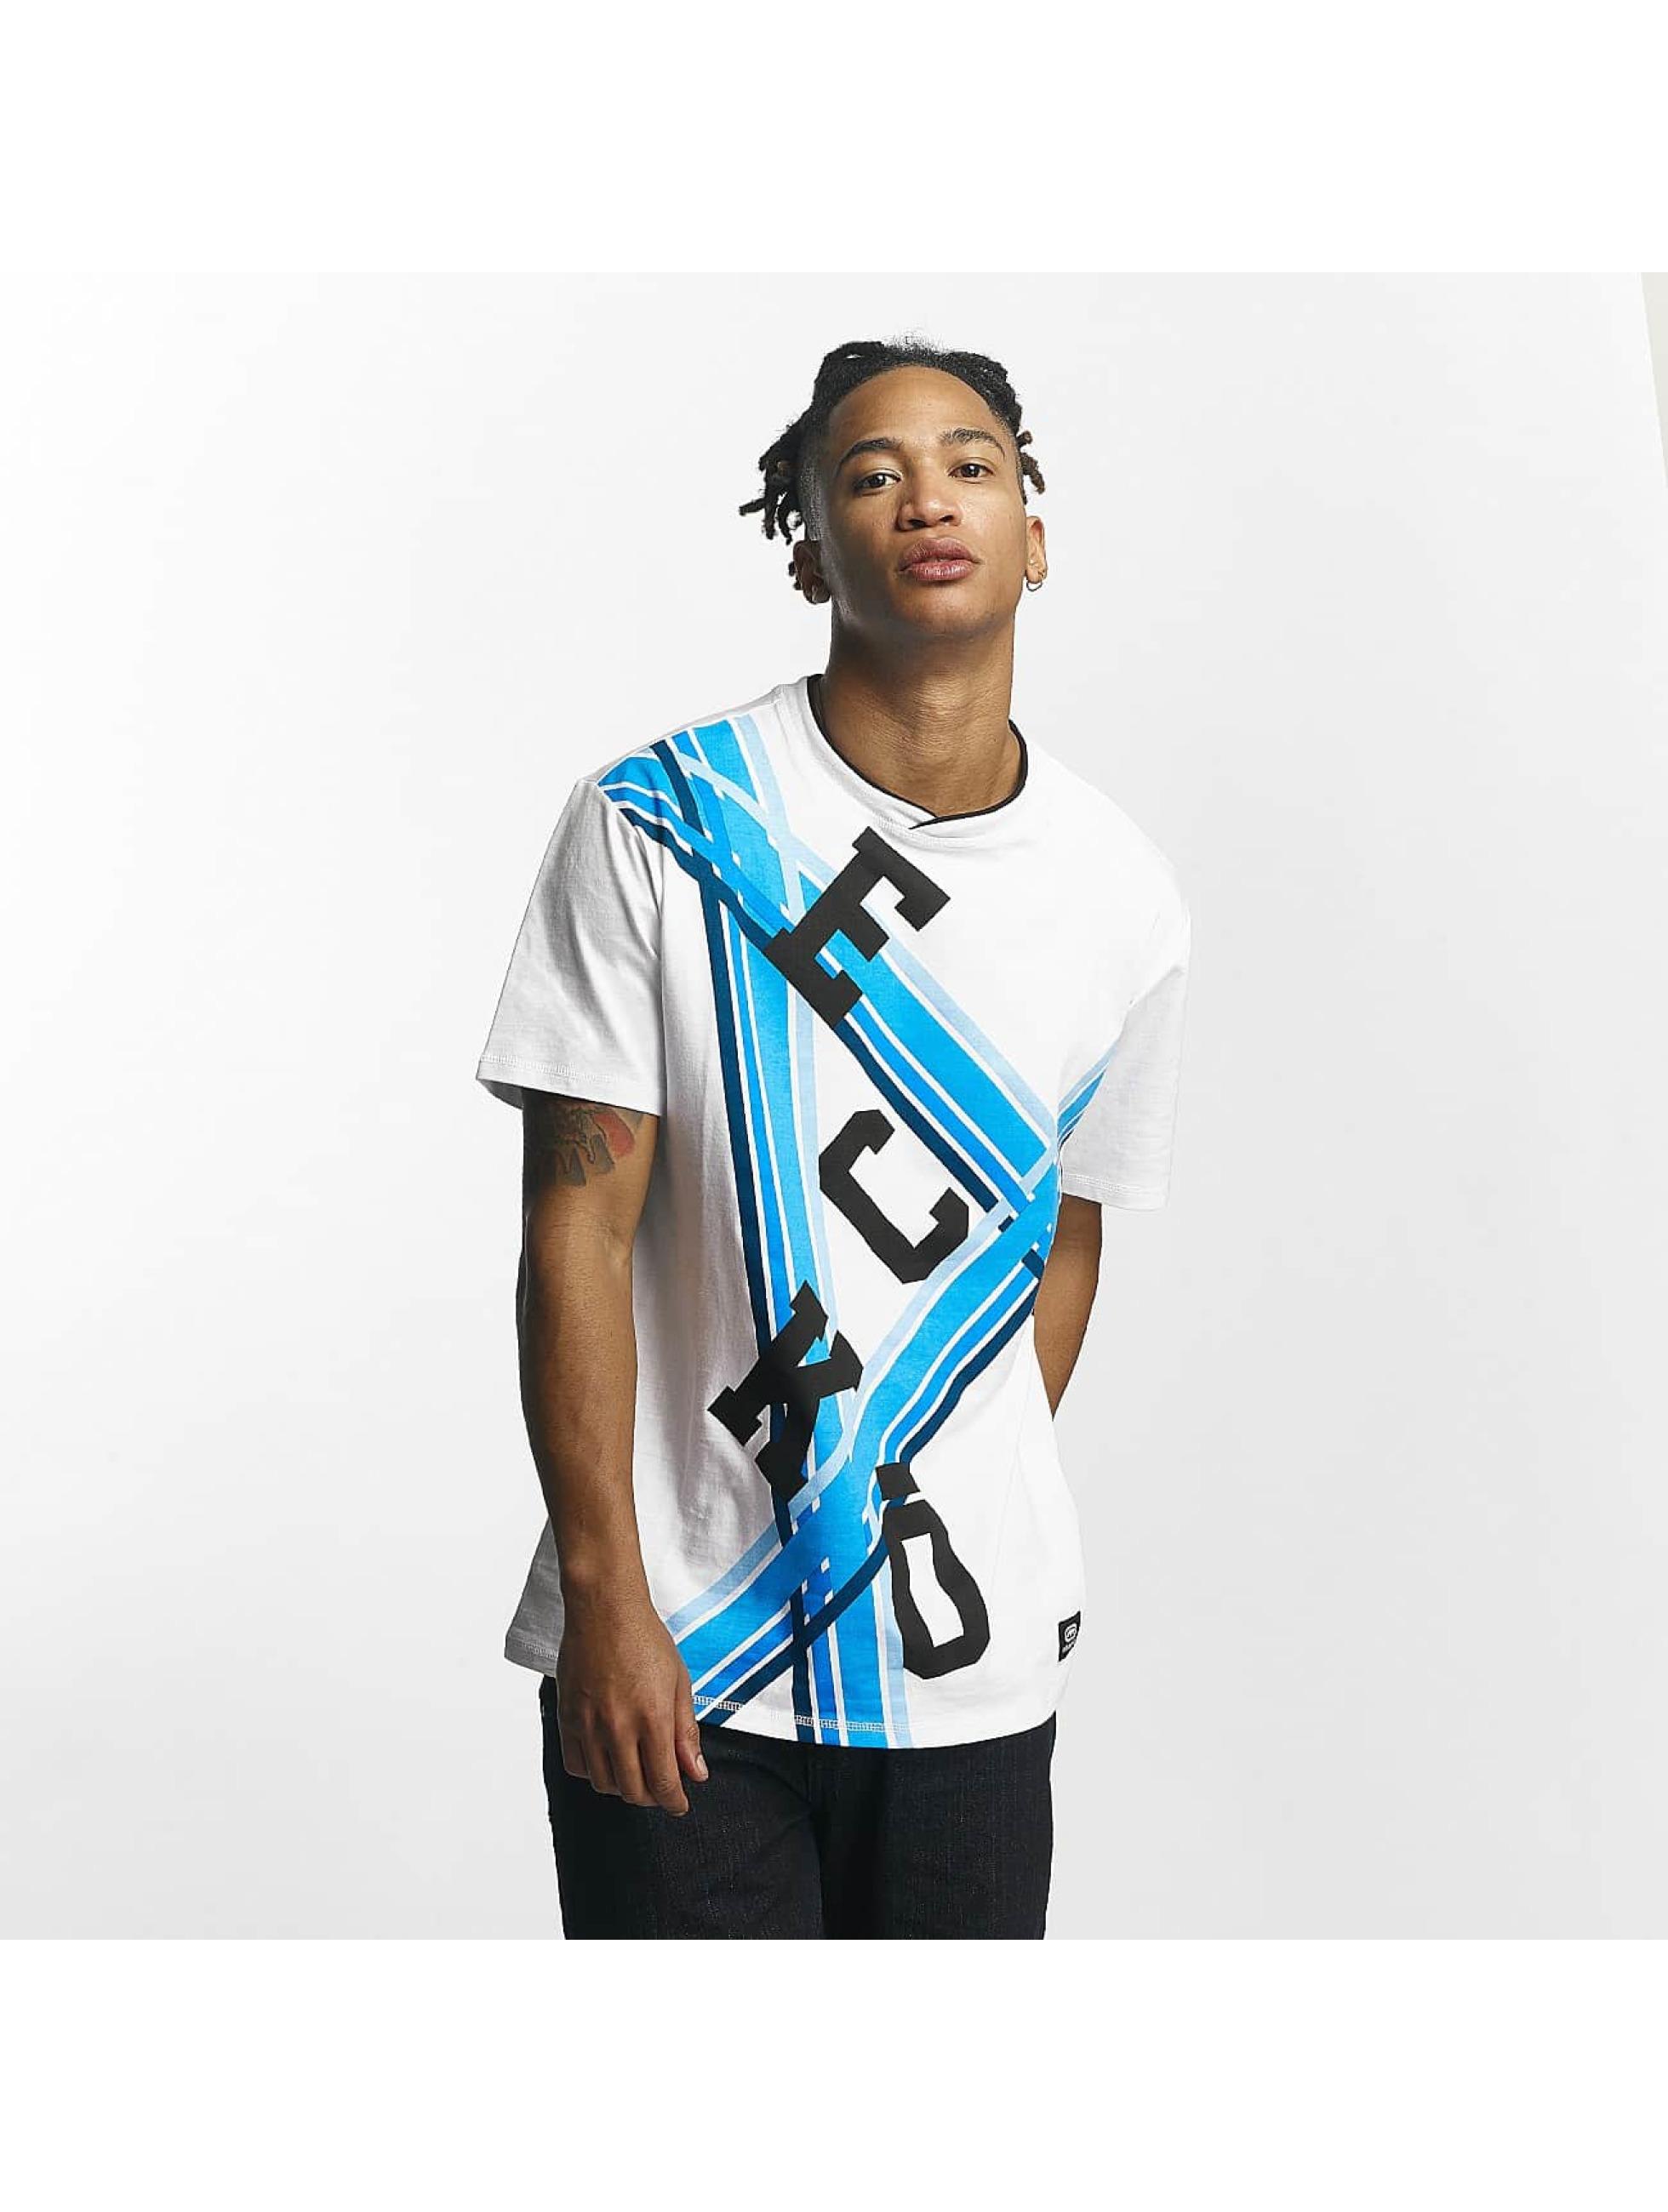 Ecko Unltd. / T-Shirt DolphinBay in white 3XL